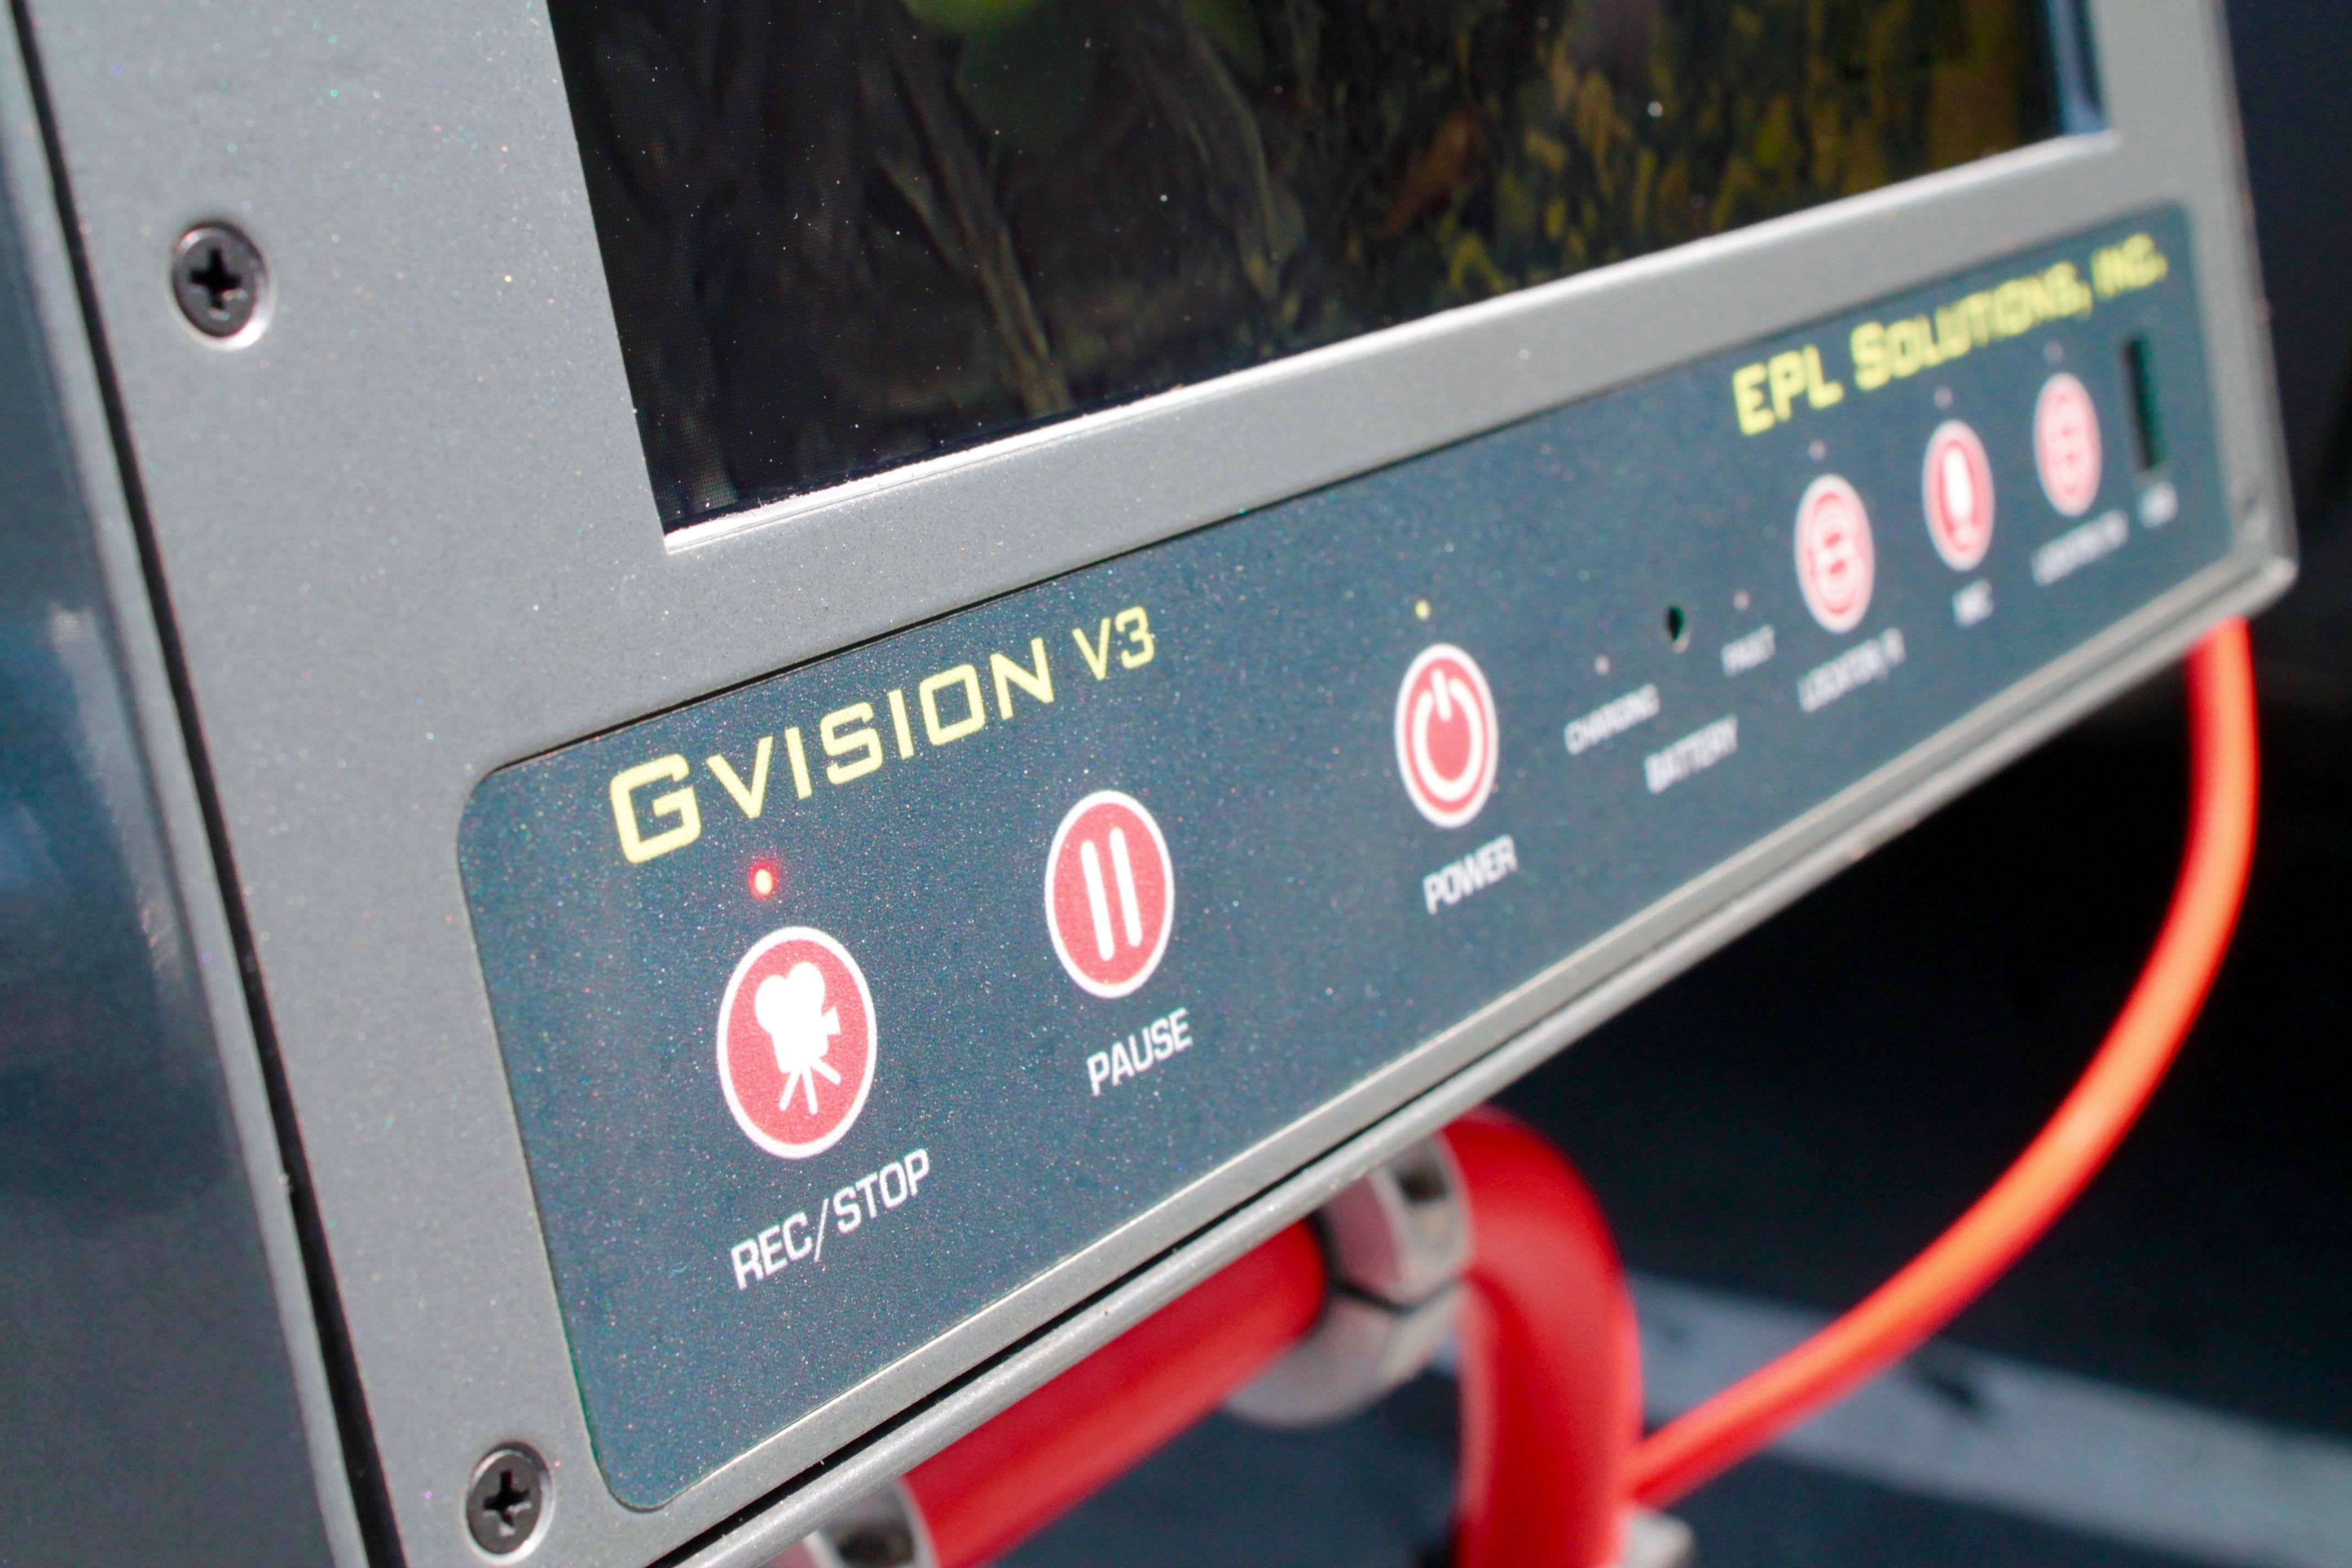 Gvision DVR